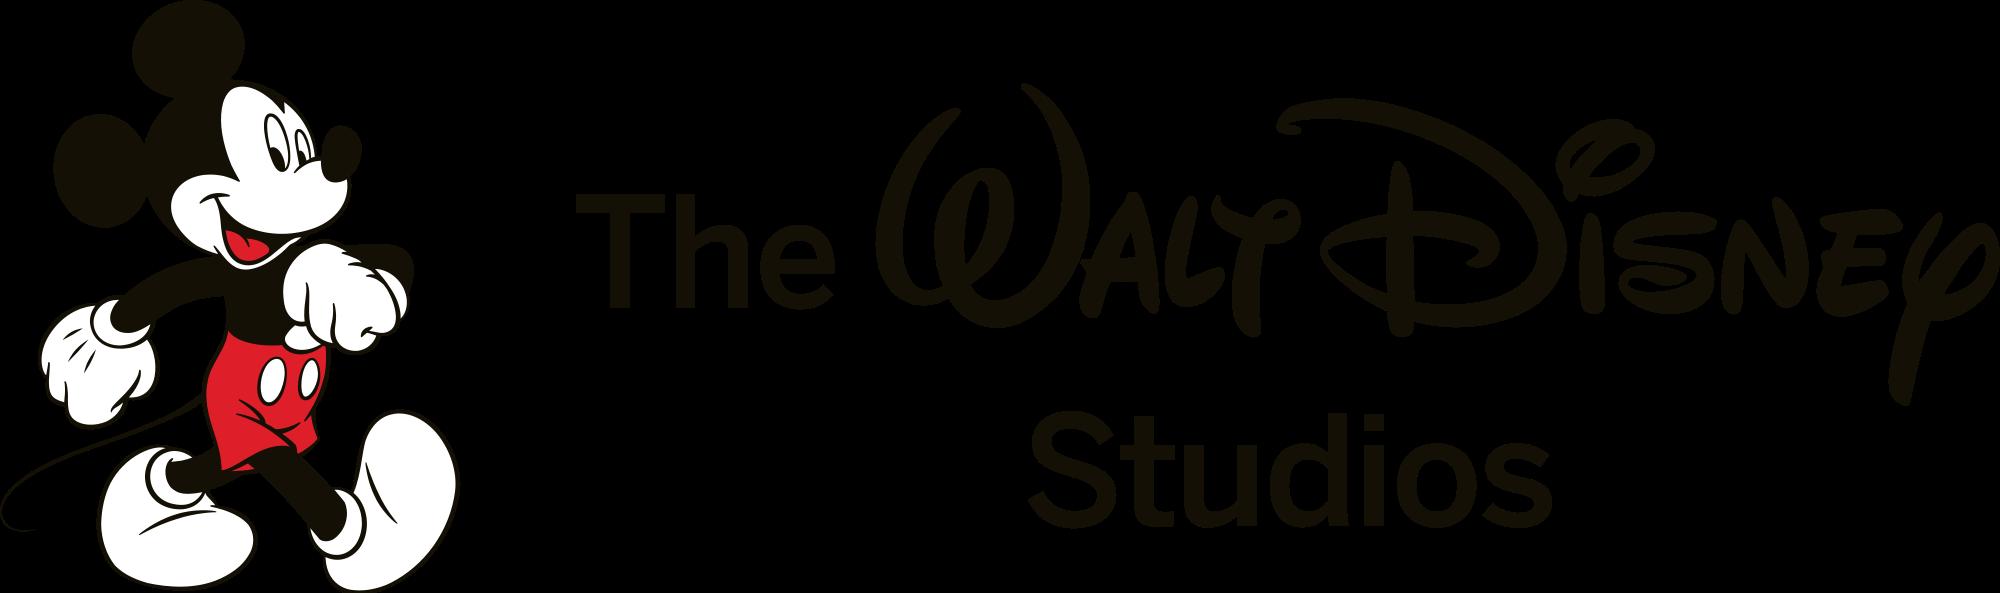 Walt Disney PNG - 37239